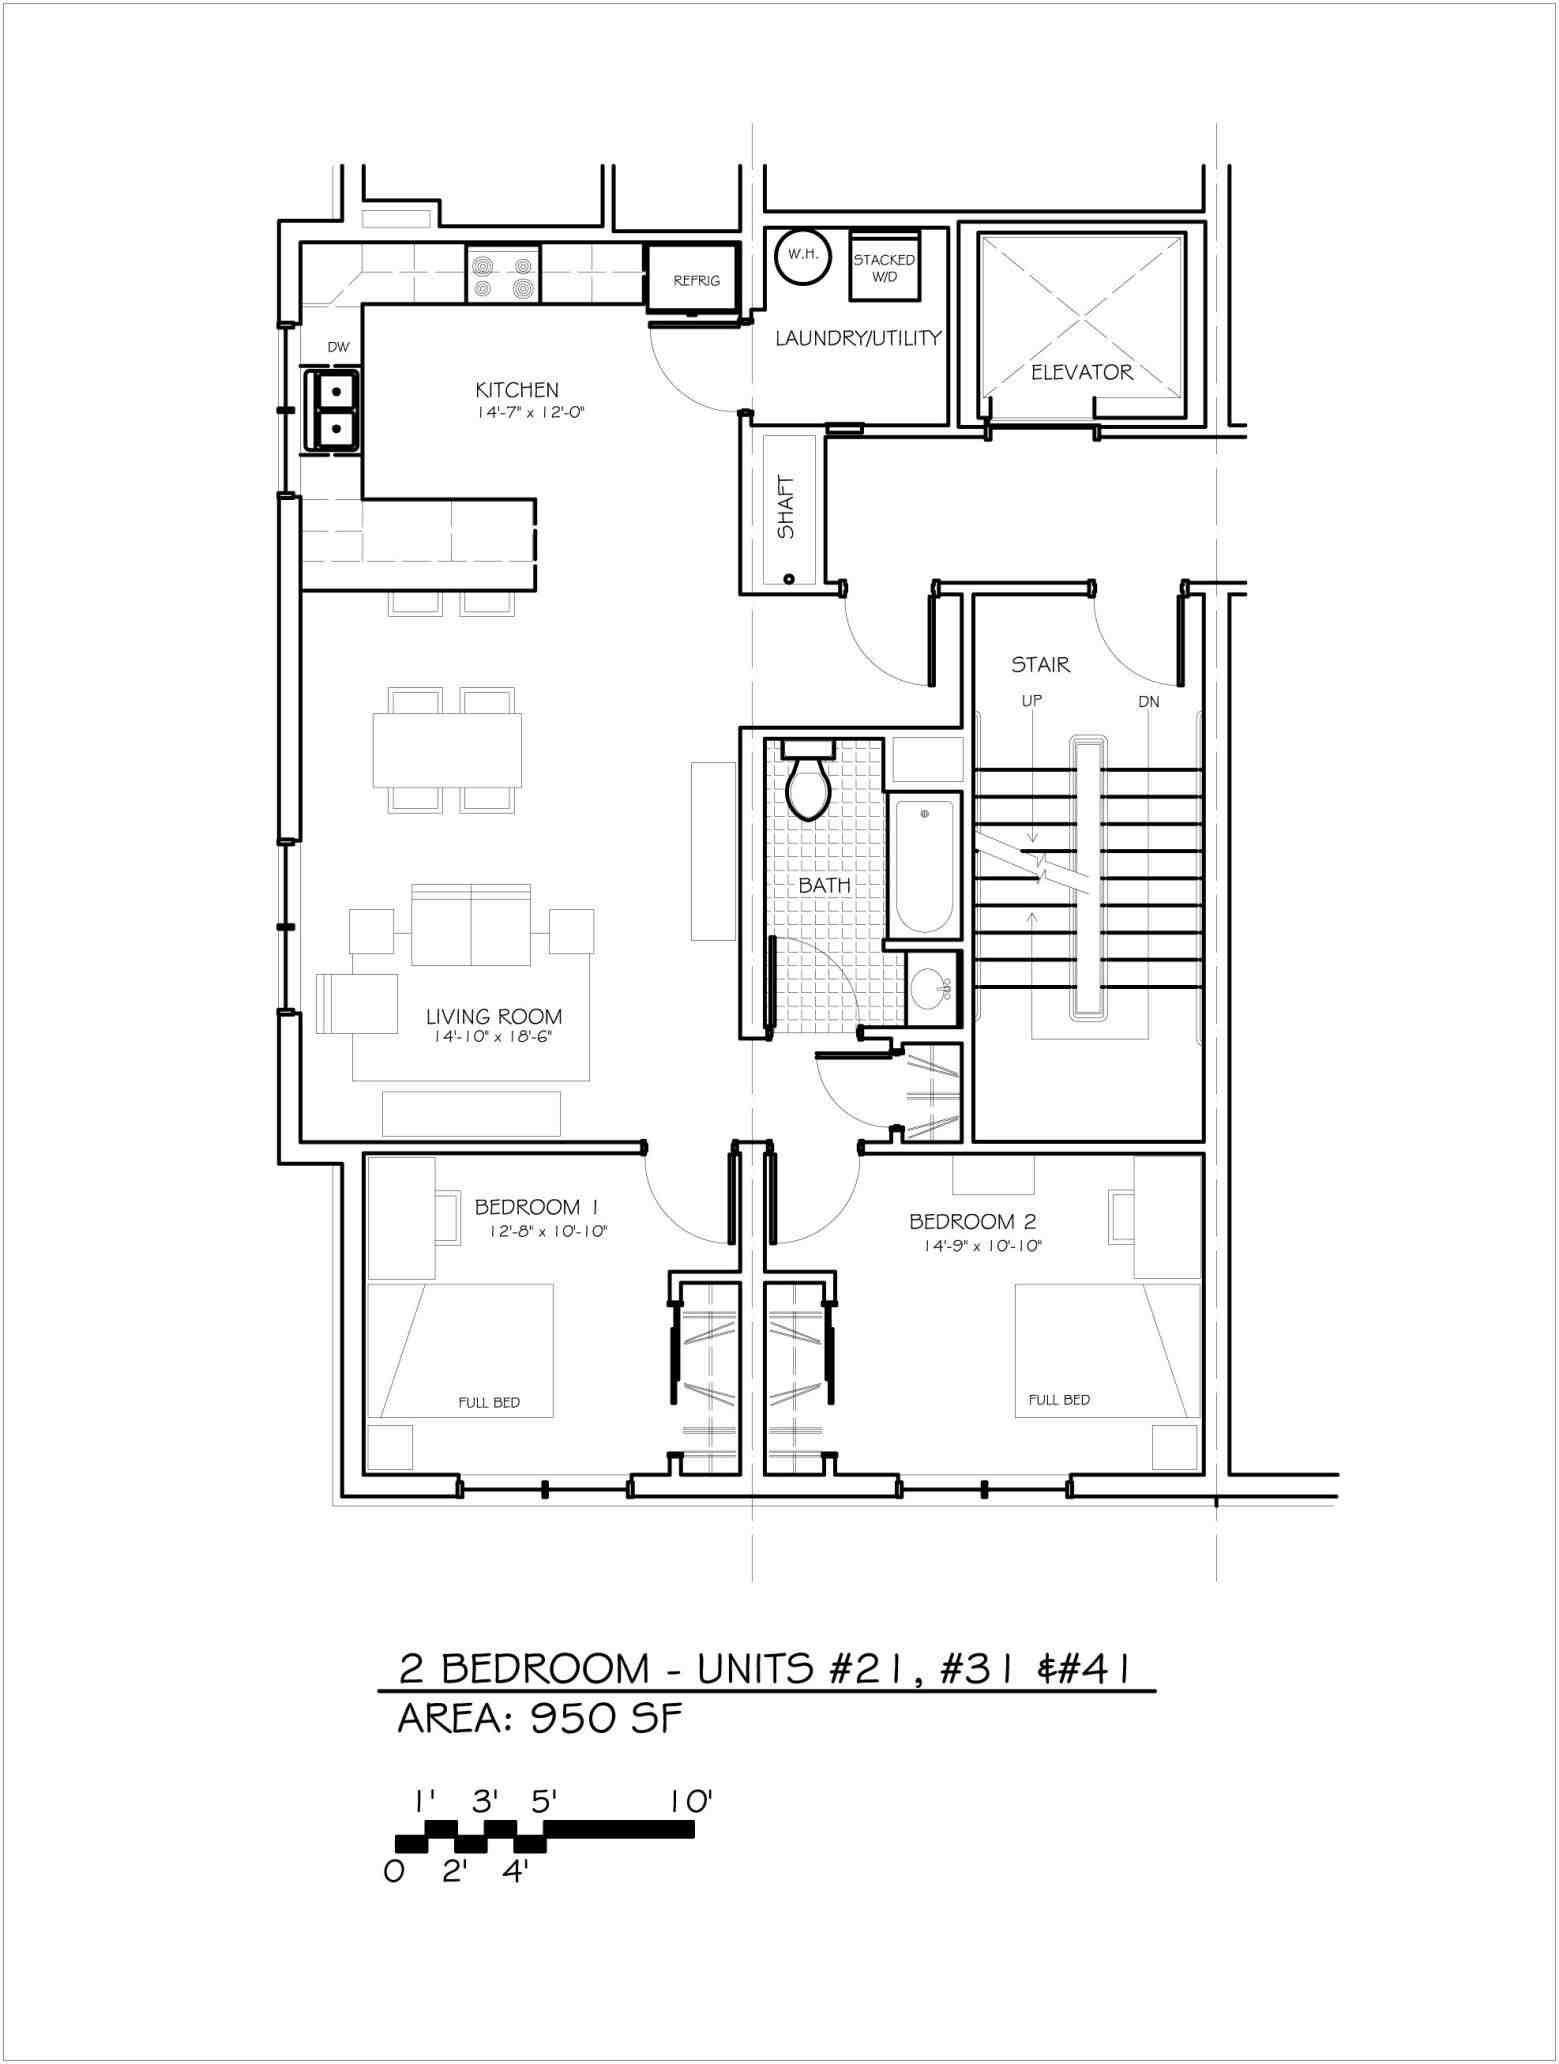 2 Bedroom 2 Bath Apartment Floor Plans Apartment Floor Plans